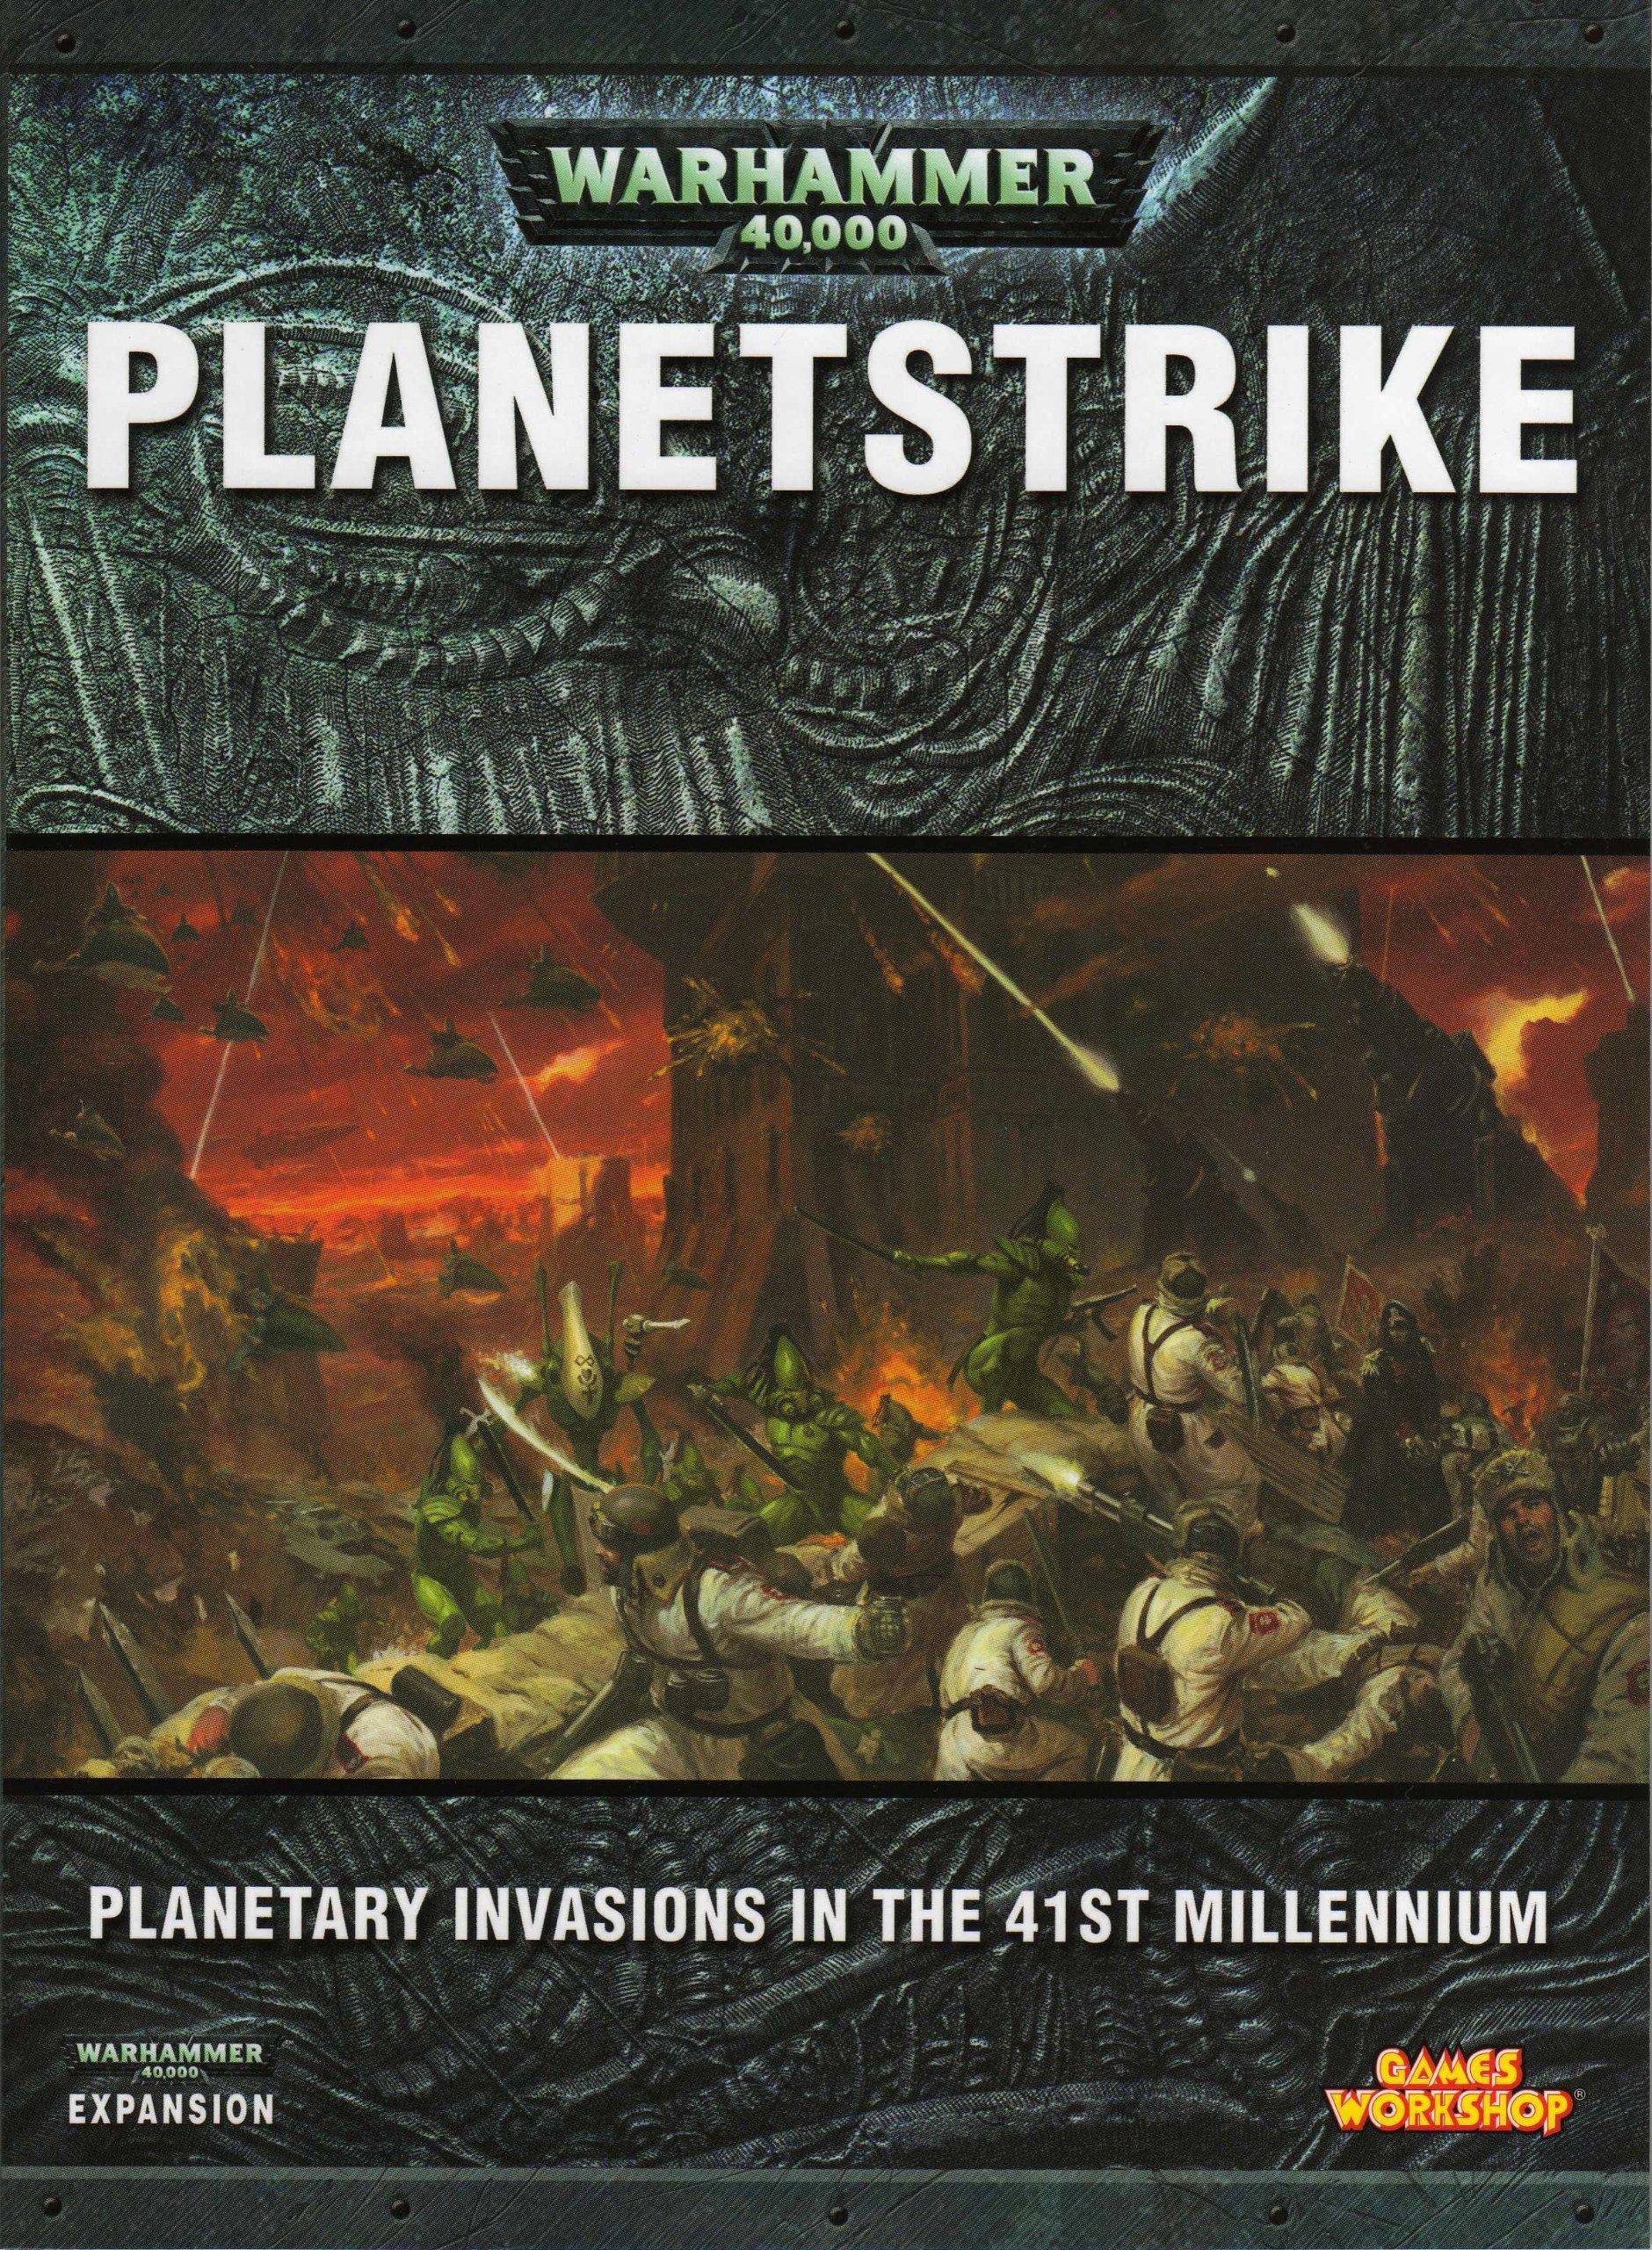 Warhammer 40k Planetstrike: 9781841549316: Amazon.com: Books